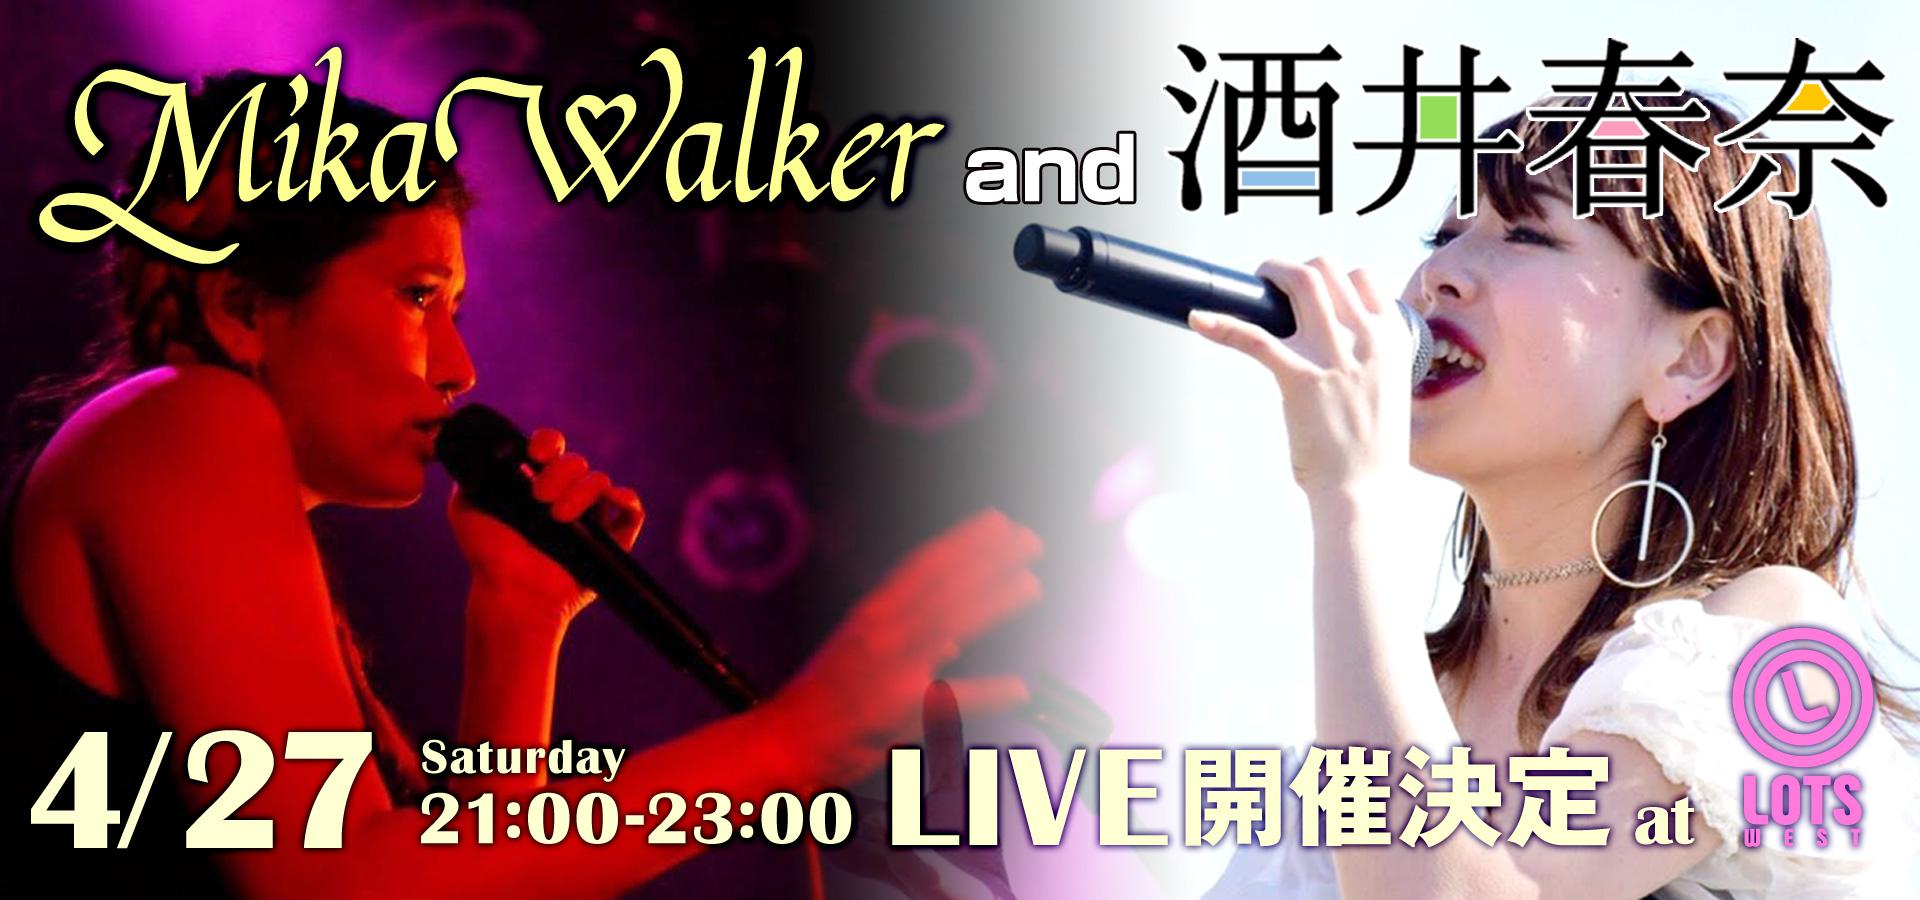 【LIVE告知】MikaWalker and 酒井春奈  Live開催決定‼︎ 4/27(Sat)